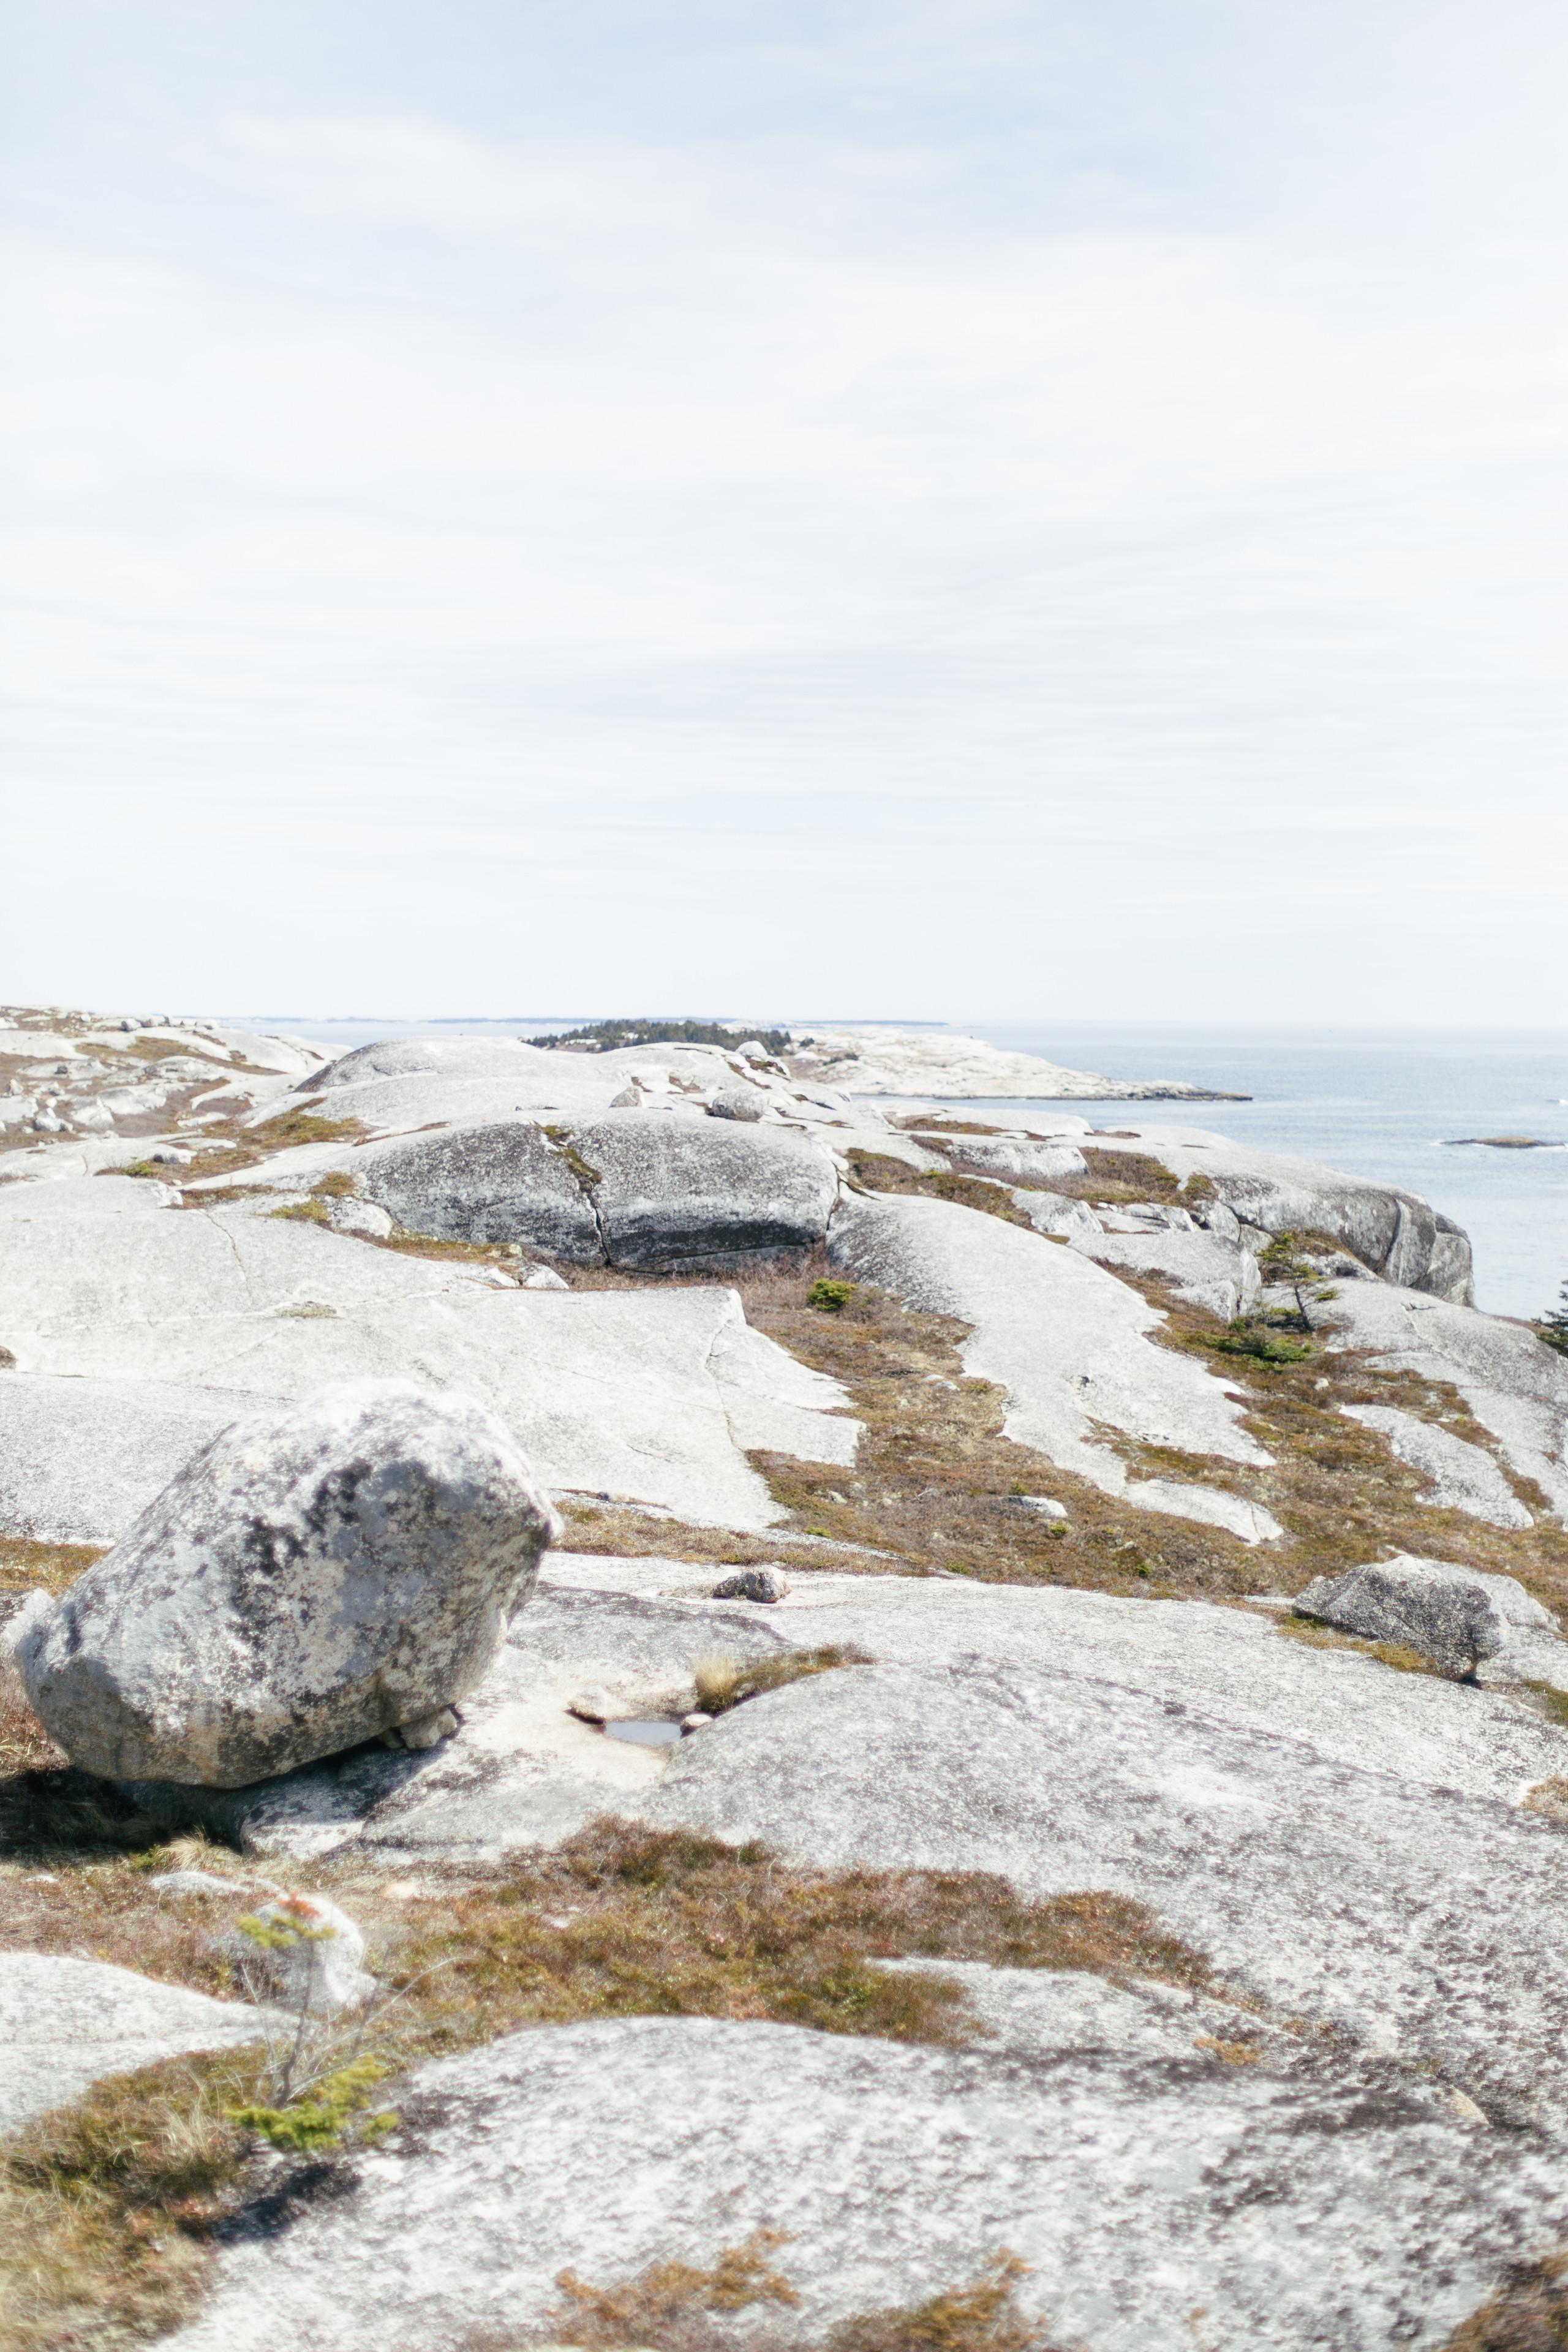 Polly's Cove Nova Scotia